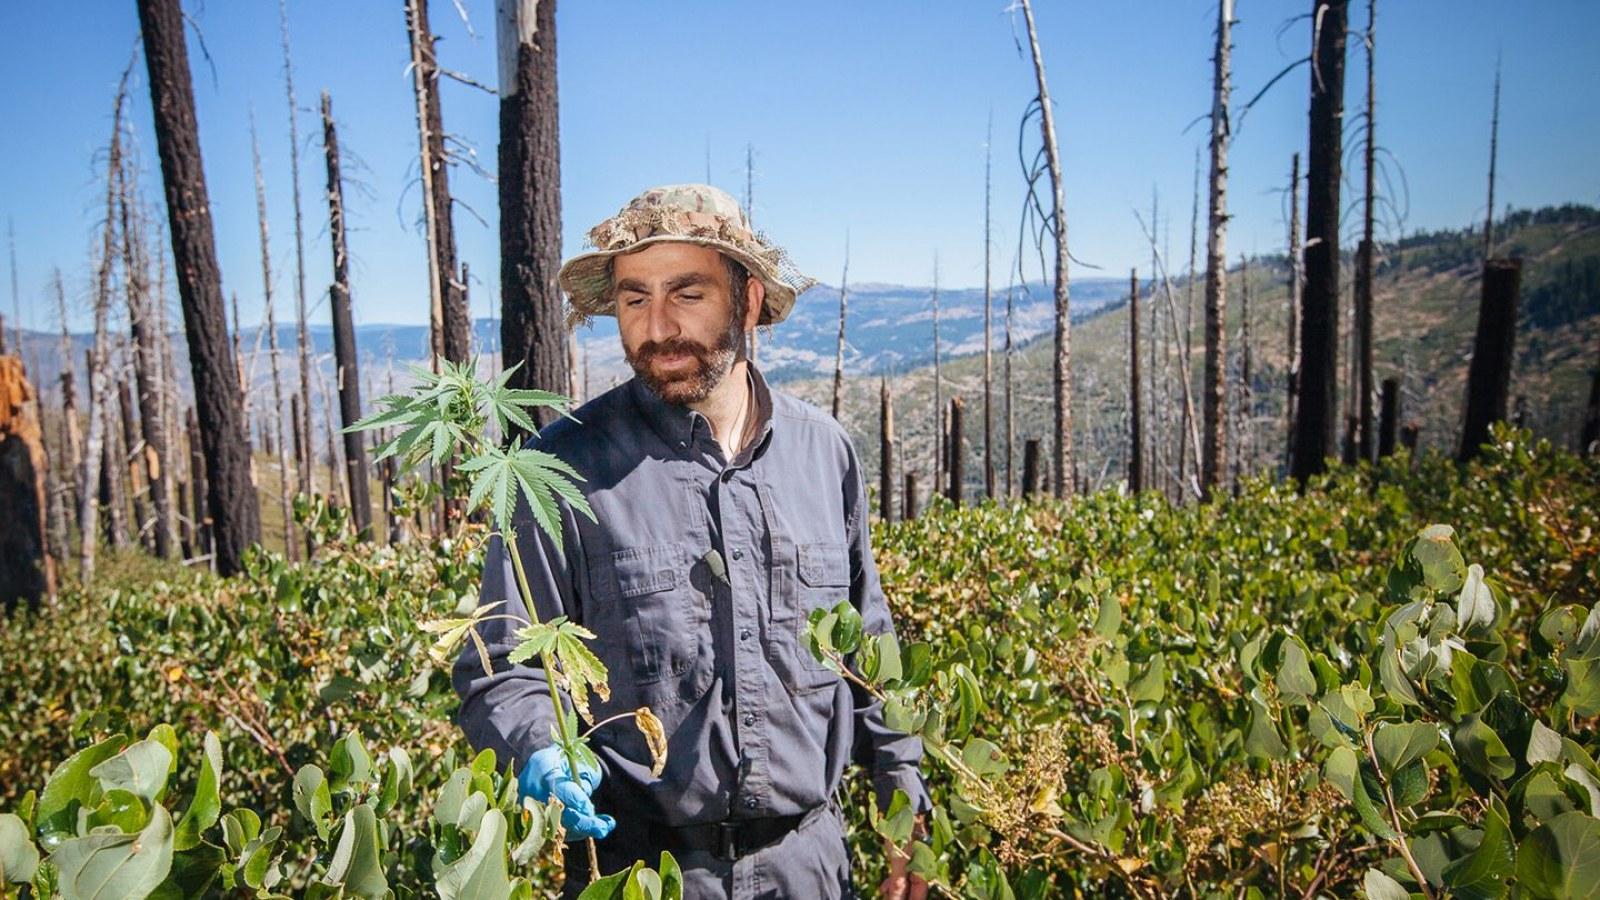 Mexican Drug Cartels May Use Legal Marijuana to Increase